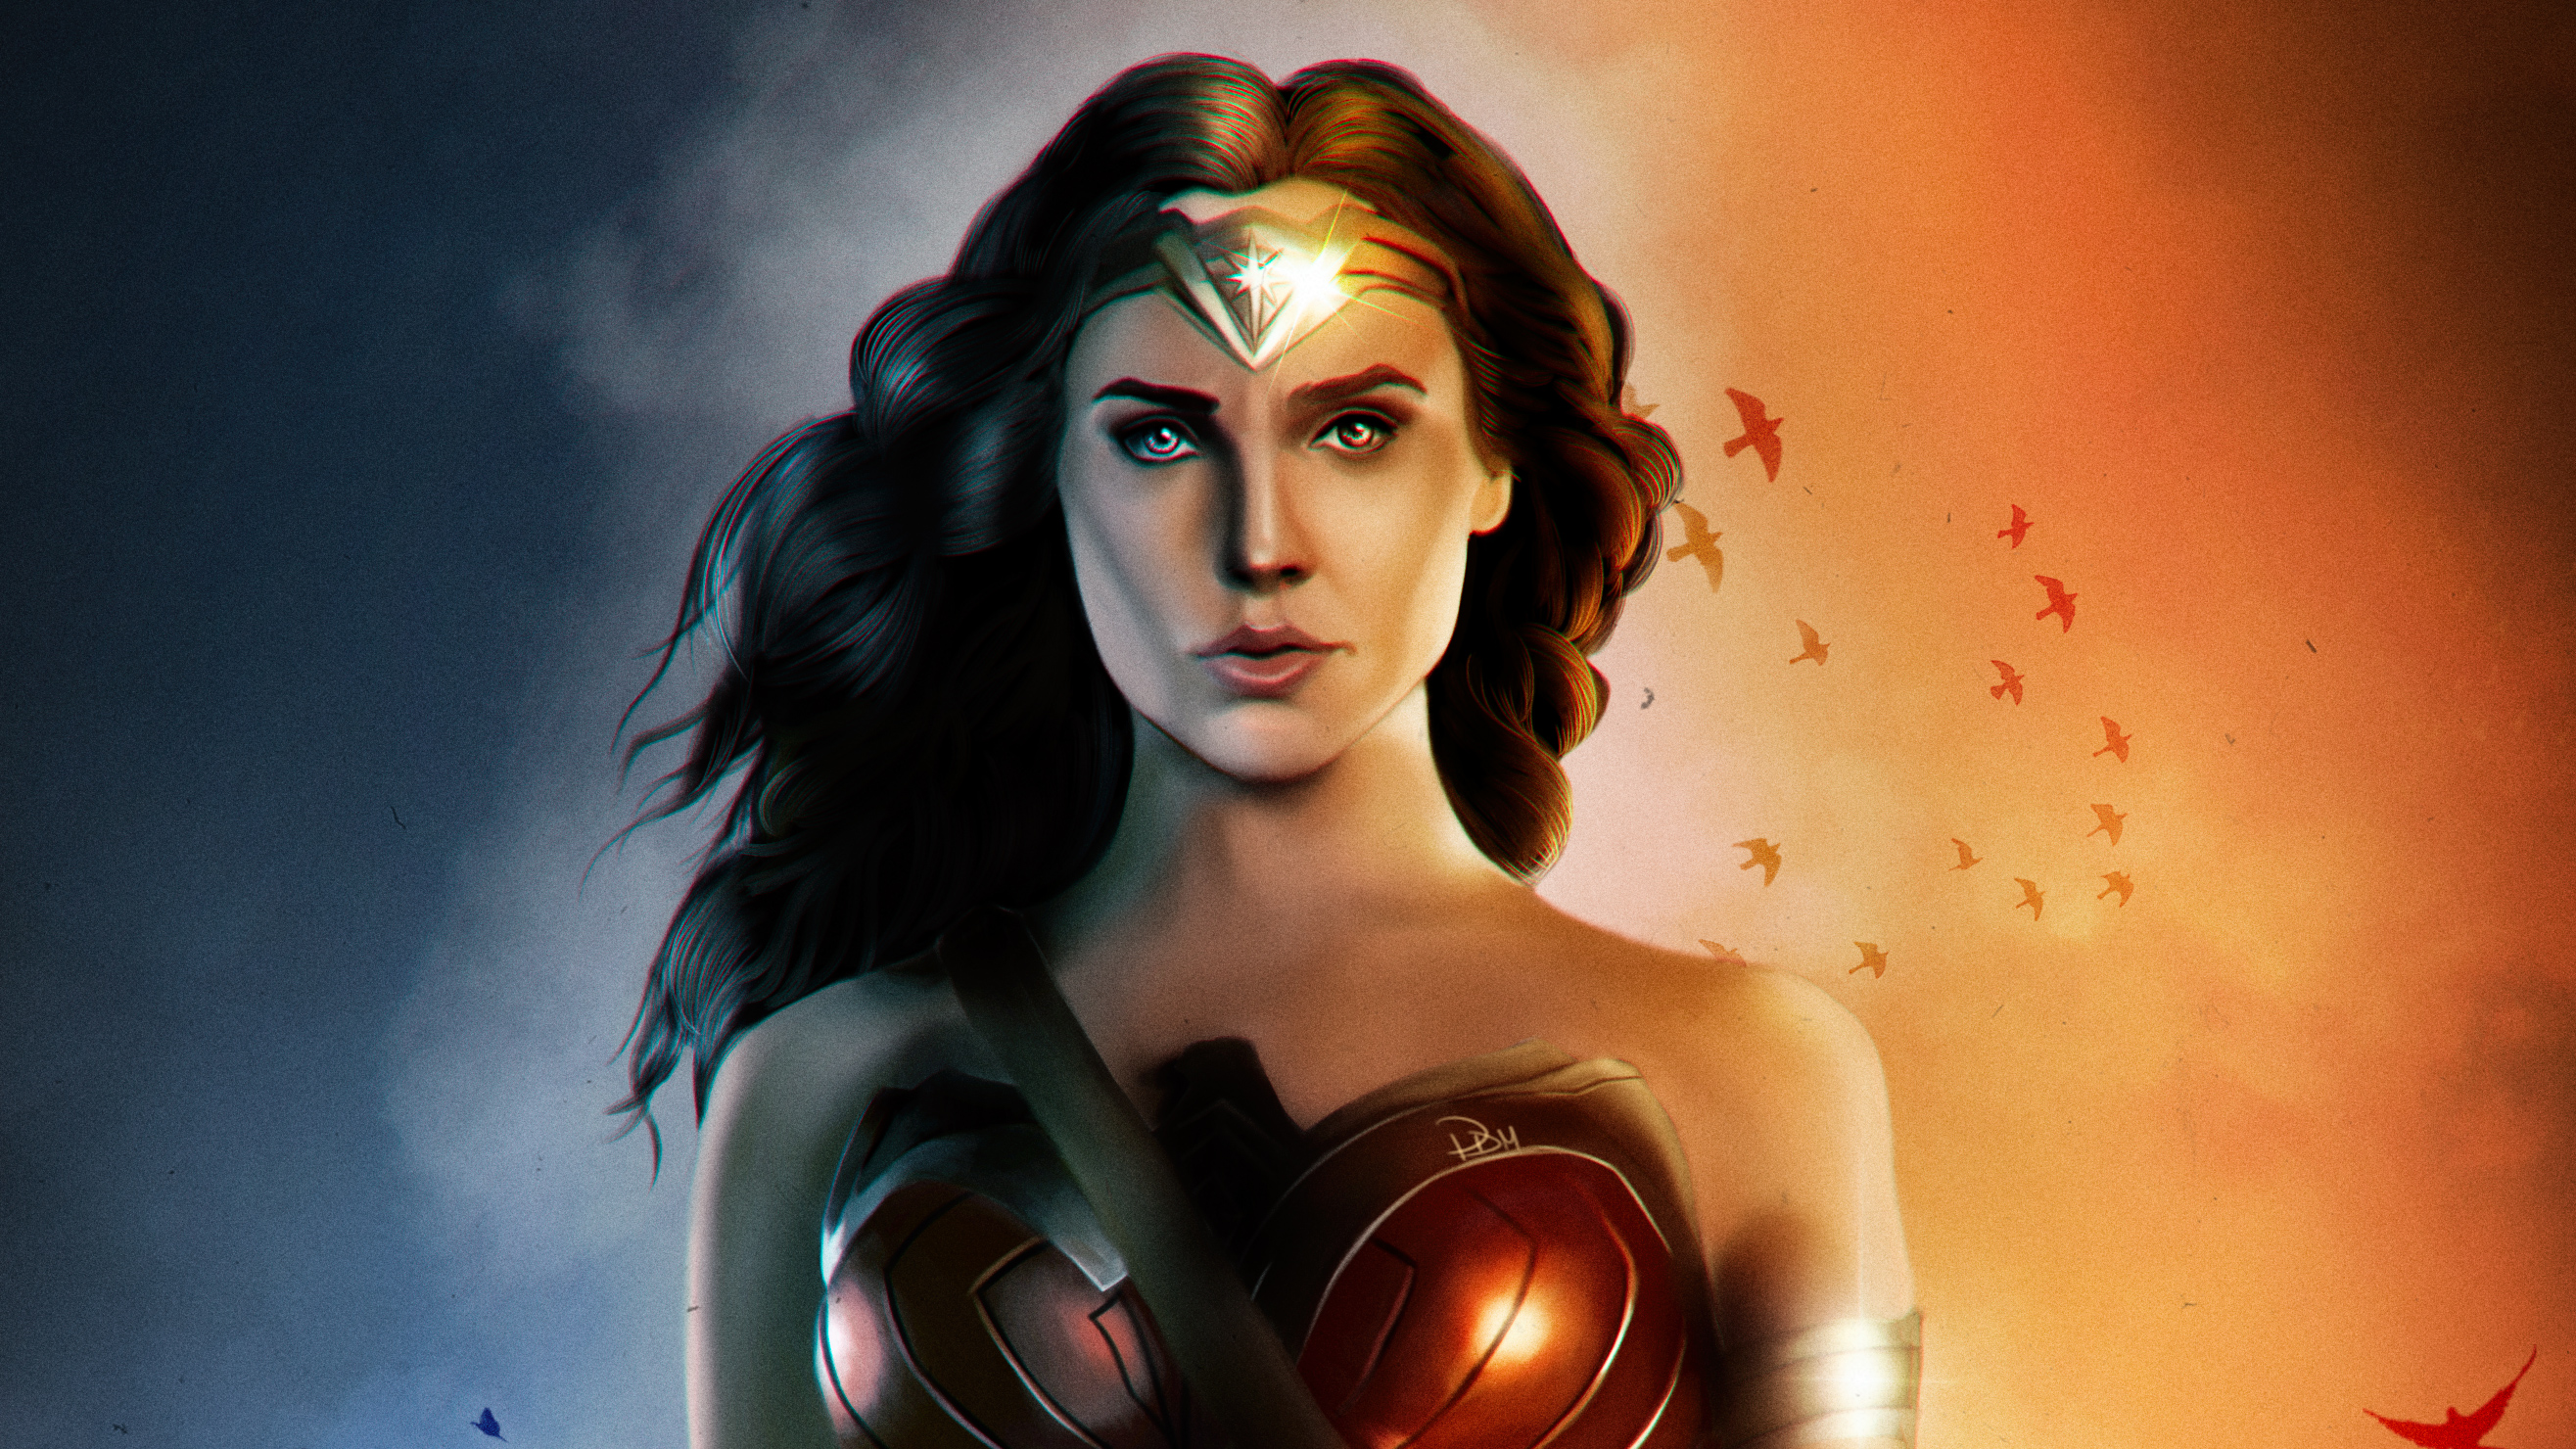 Wonder Woman Gal Gadot Fanartwork Hd Superheroes 4k Wallpapers